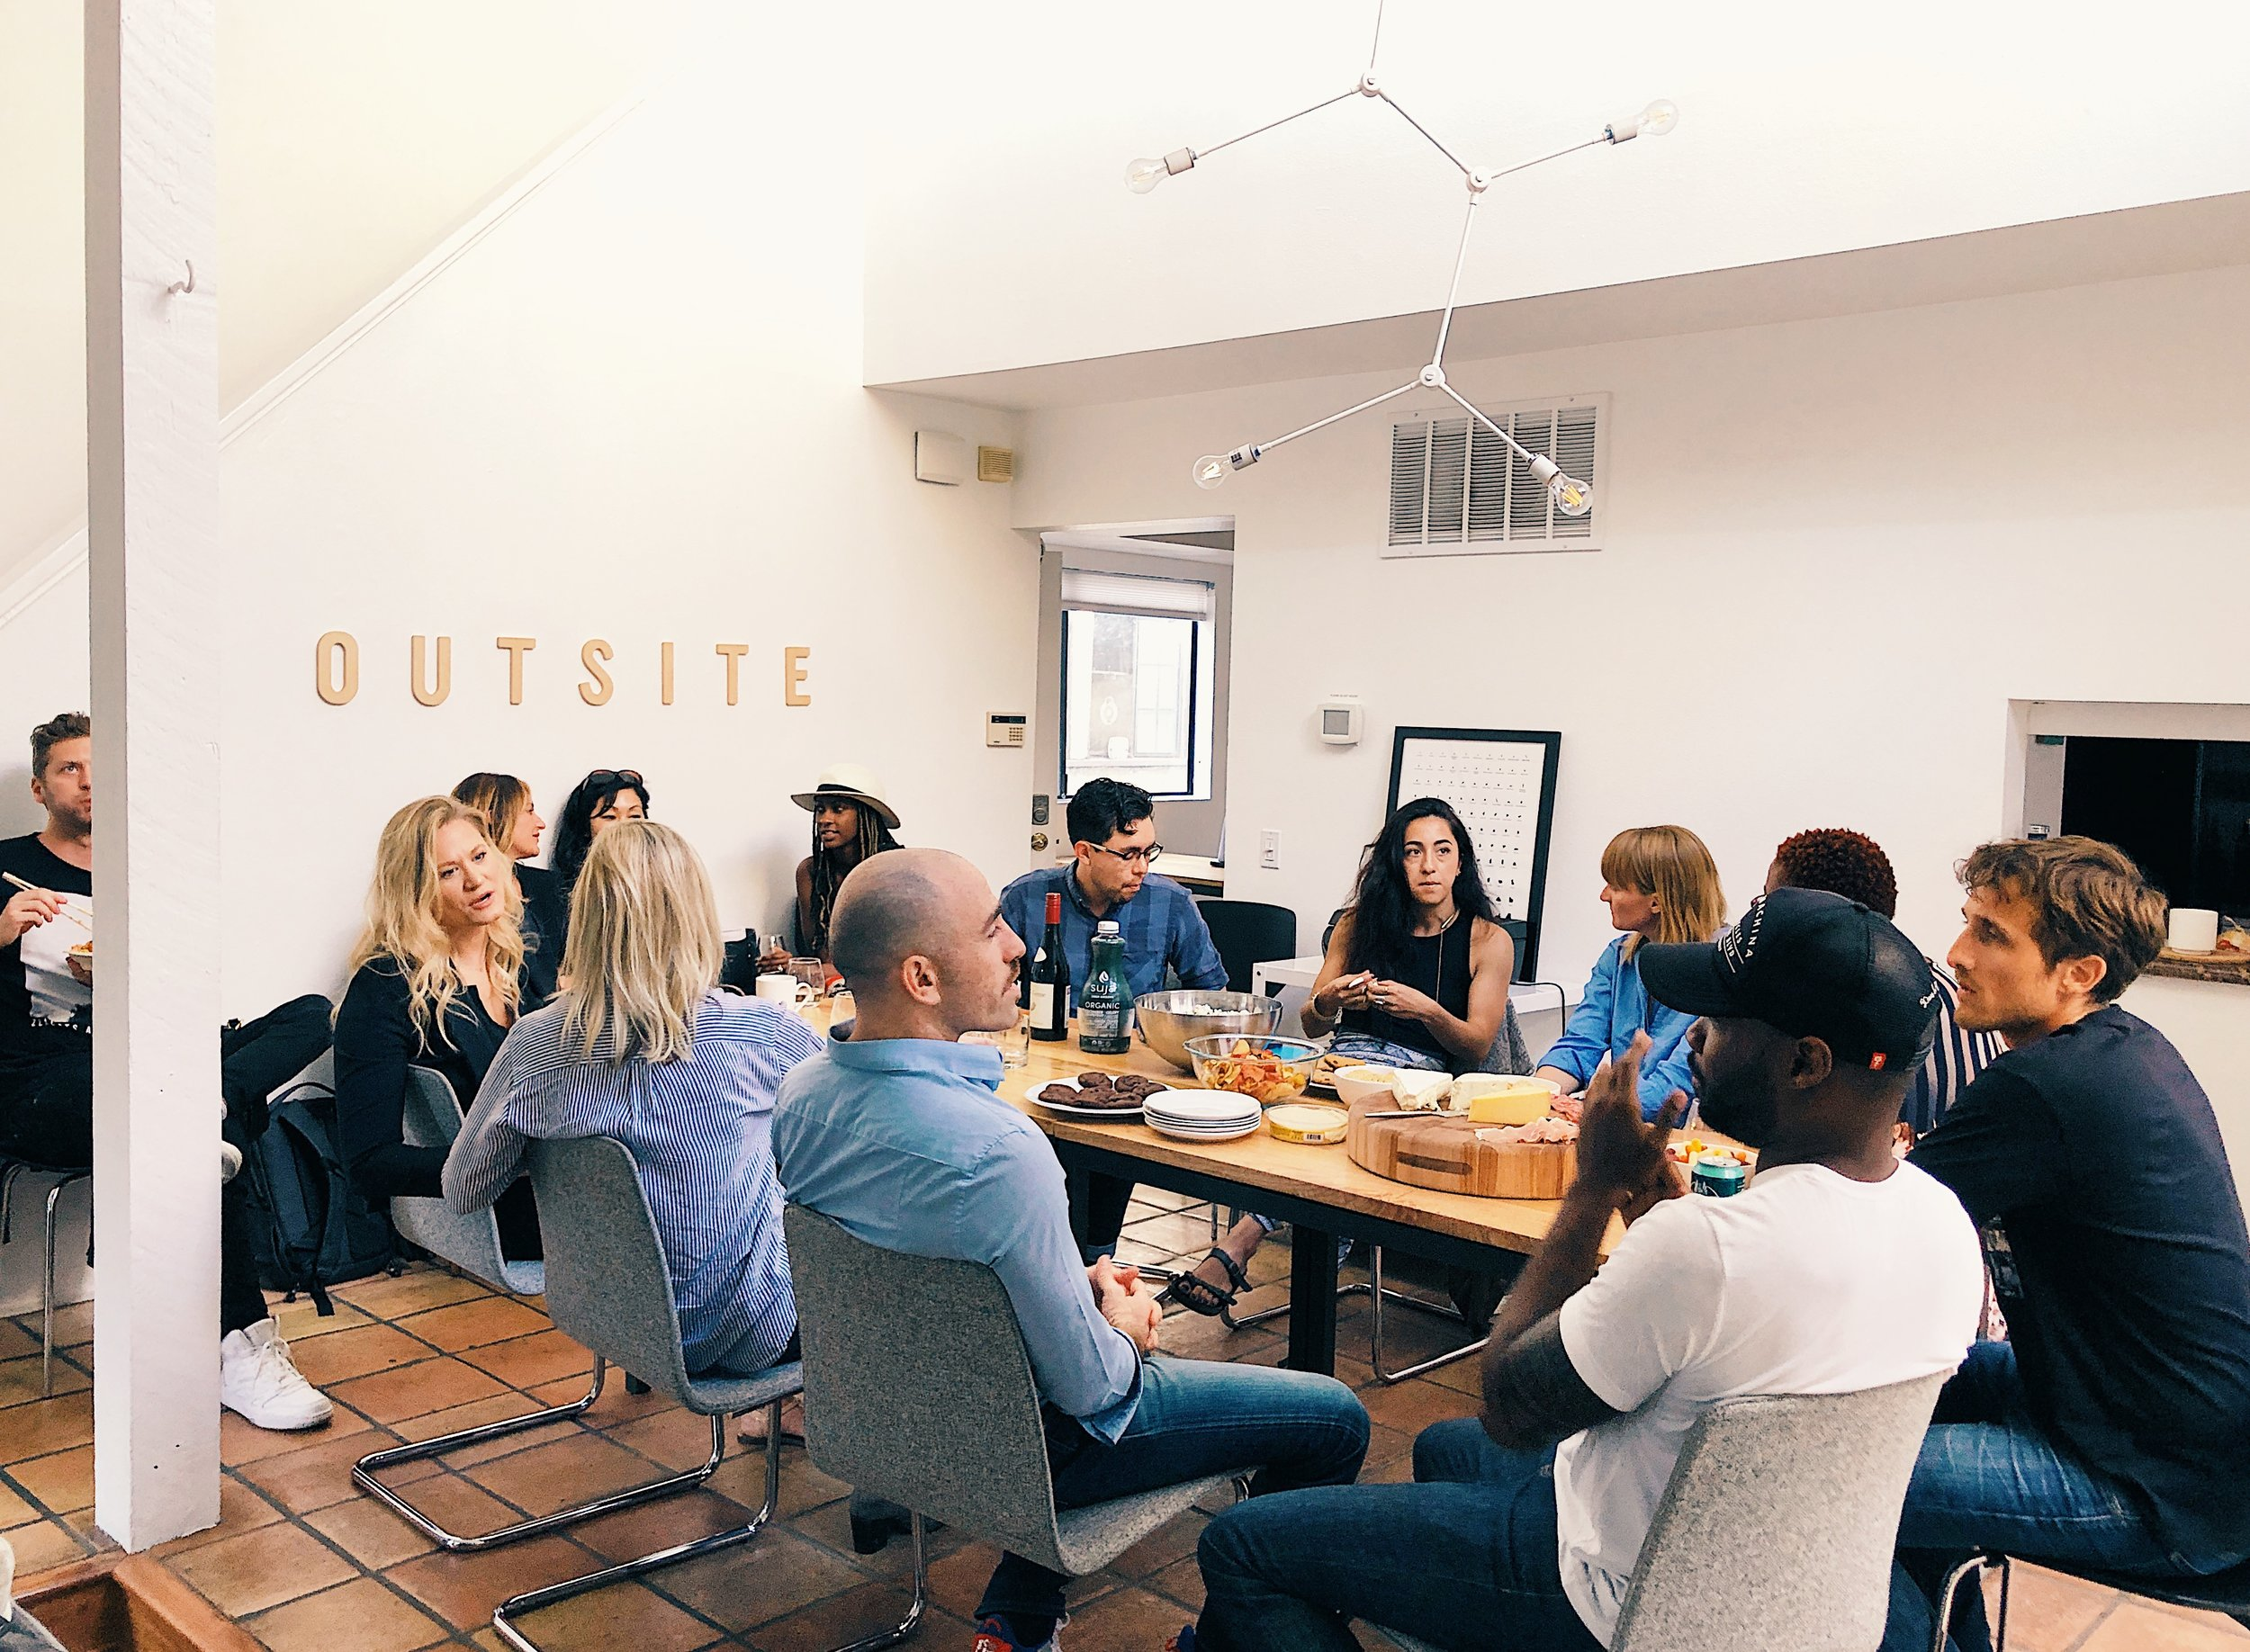 Small Business Roundtable_Outsite_CJ Johnson_Los Angeles.JPG